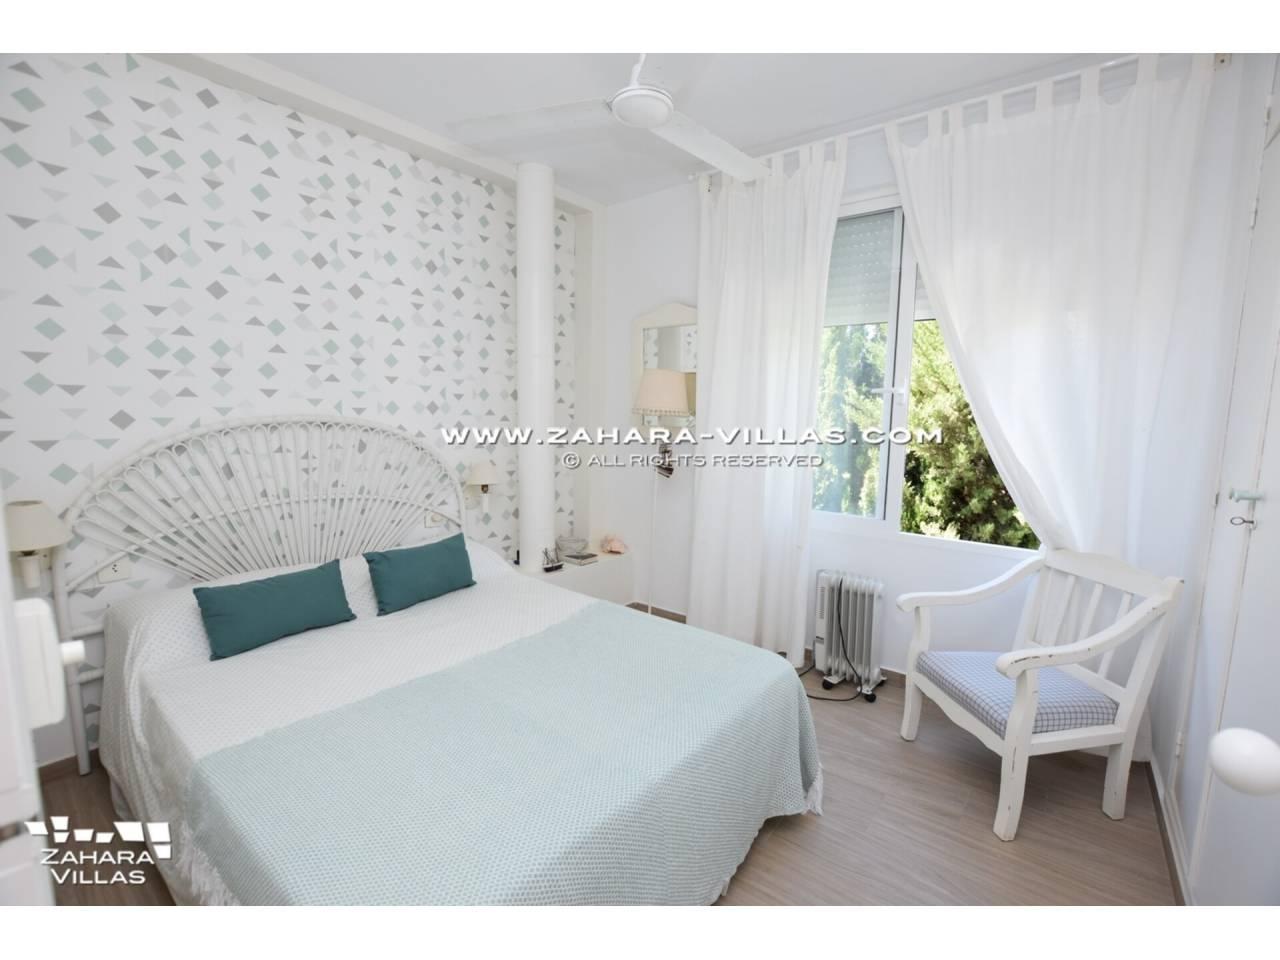 Imagen 26 de House for sale close to the beach, with sea views in Zahara de los Atunes